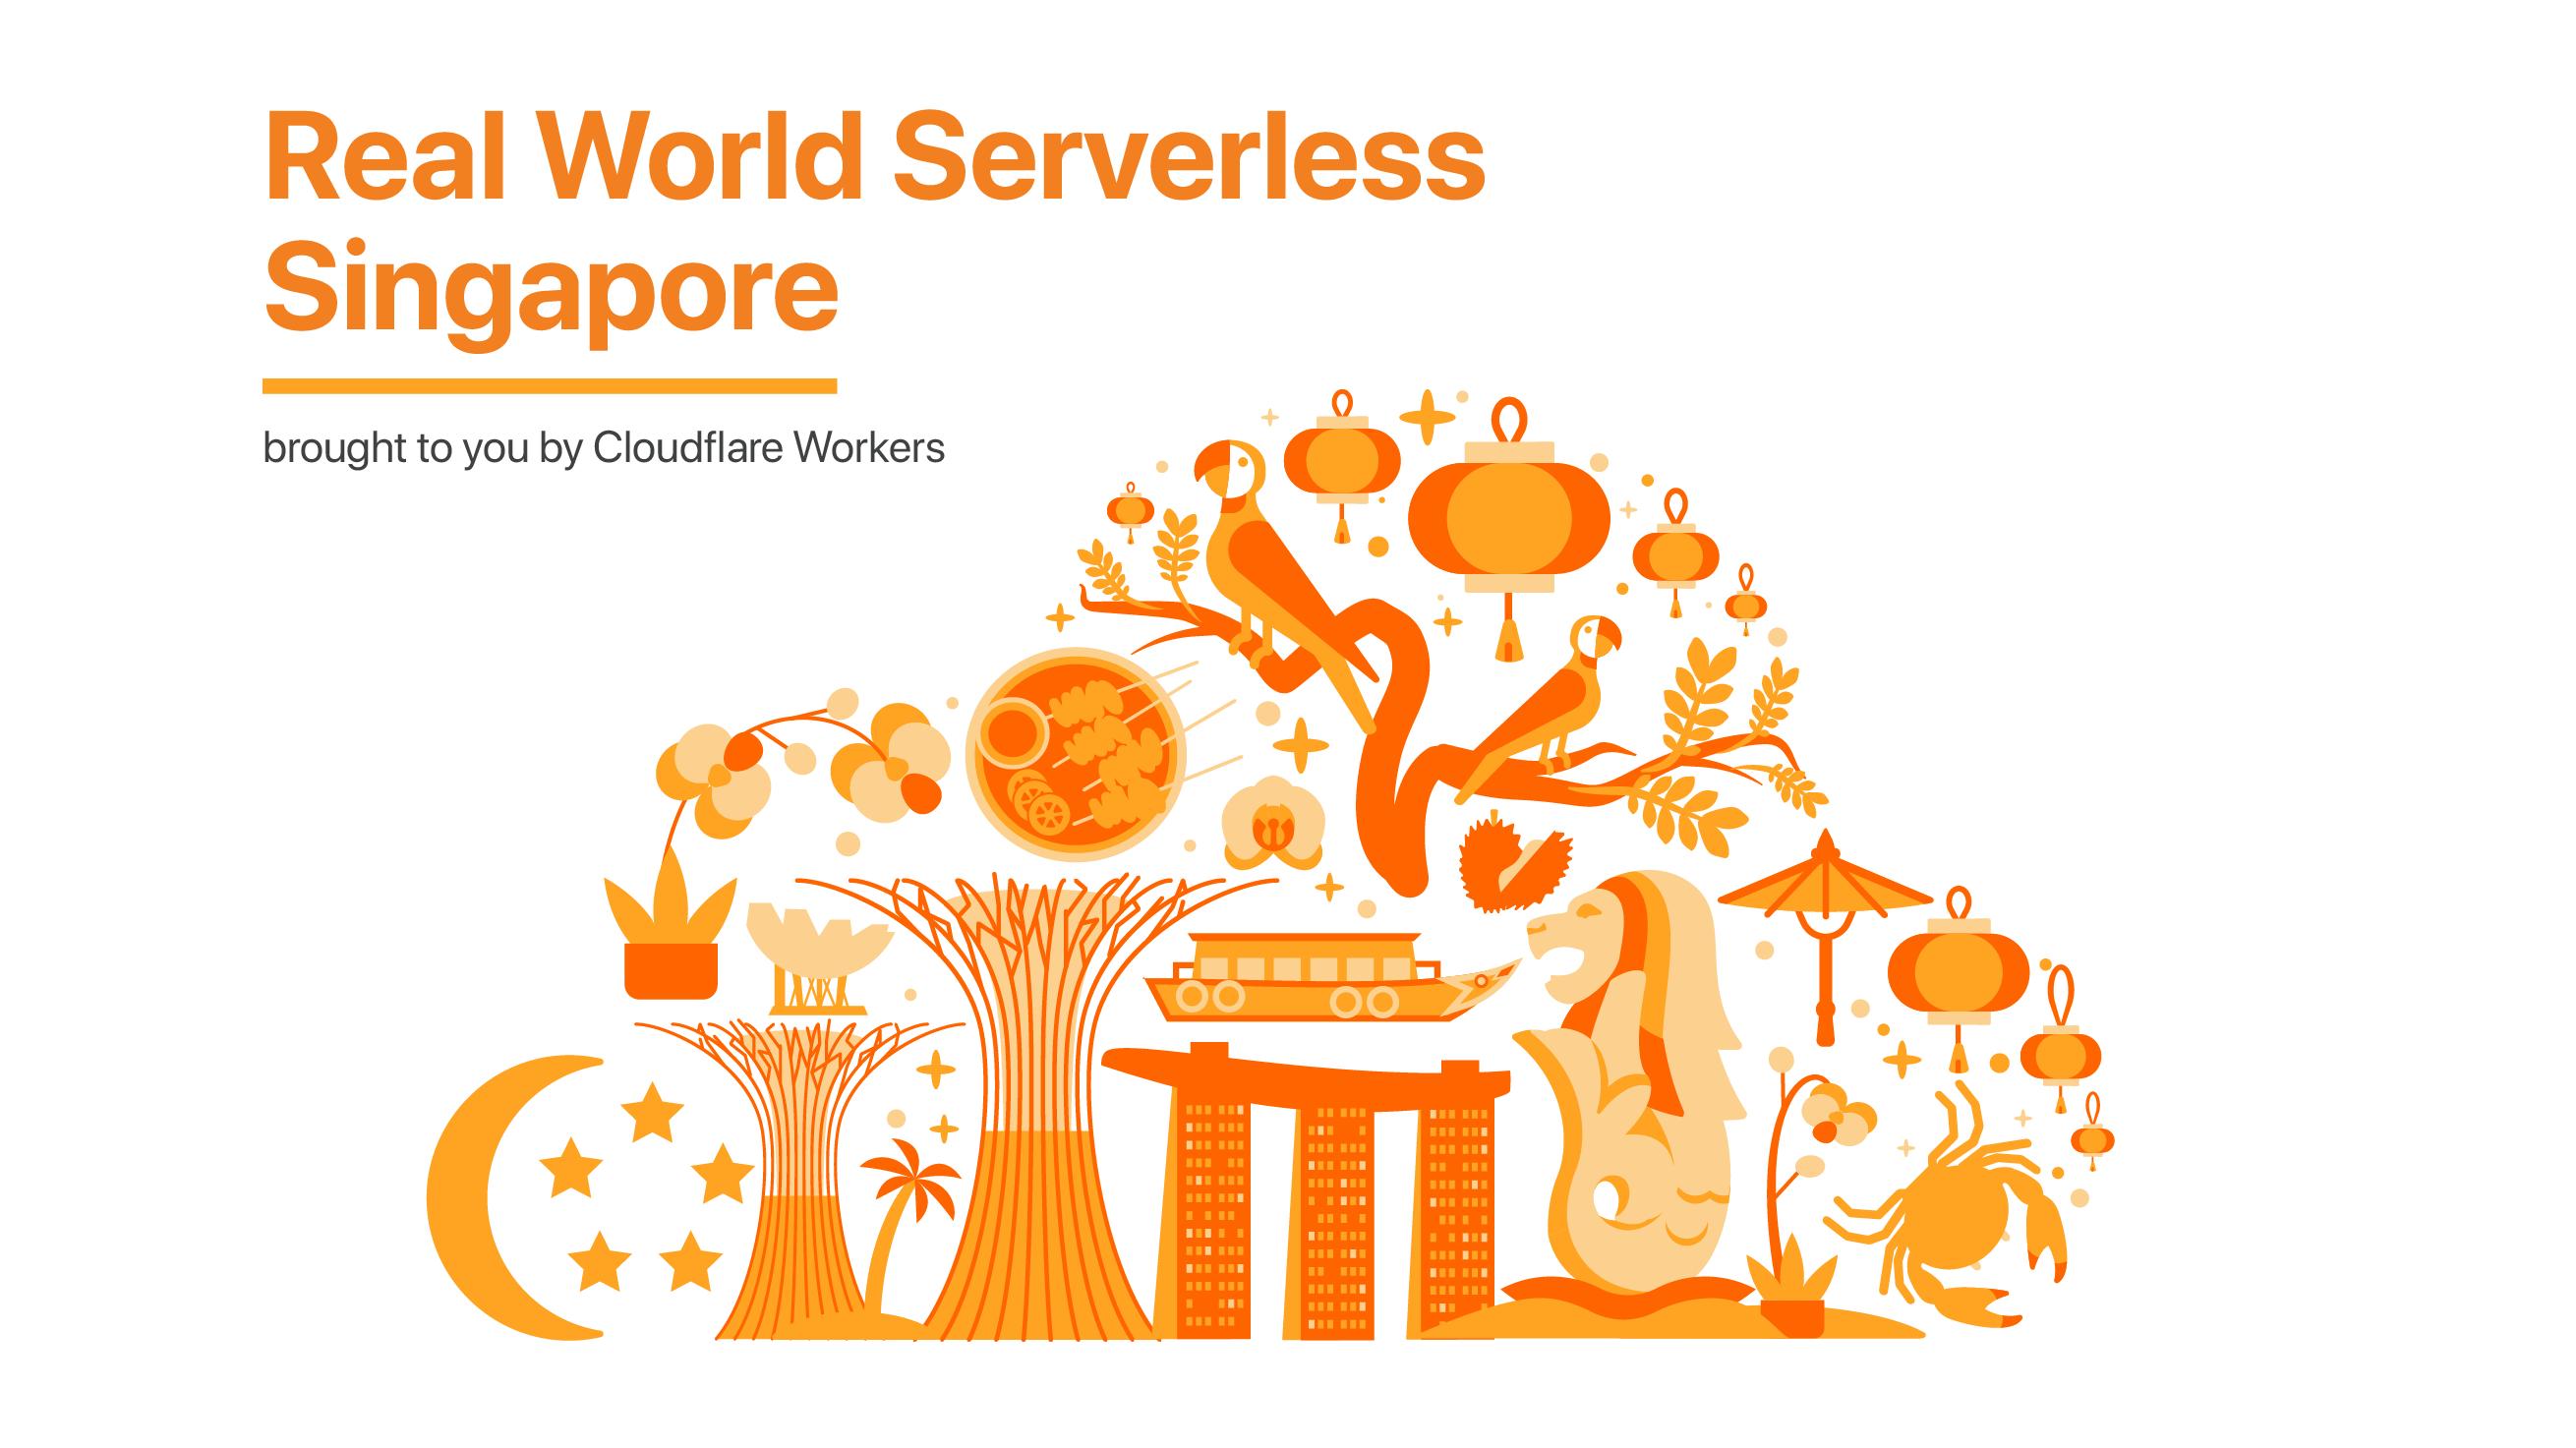 Real World Serverless - Singapore